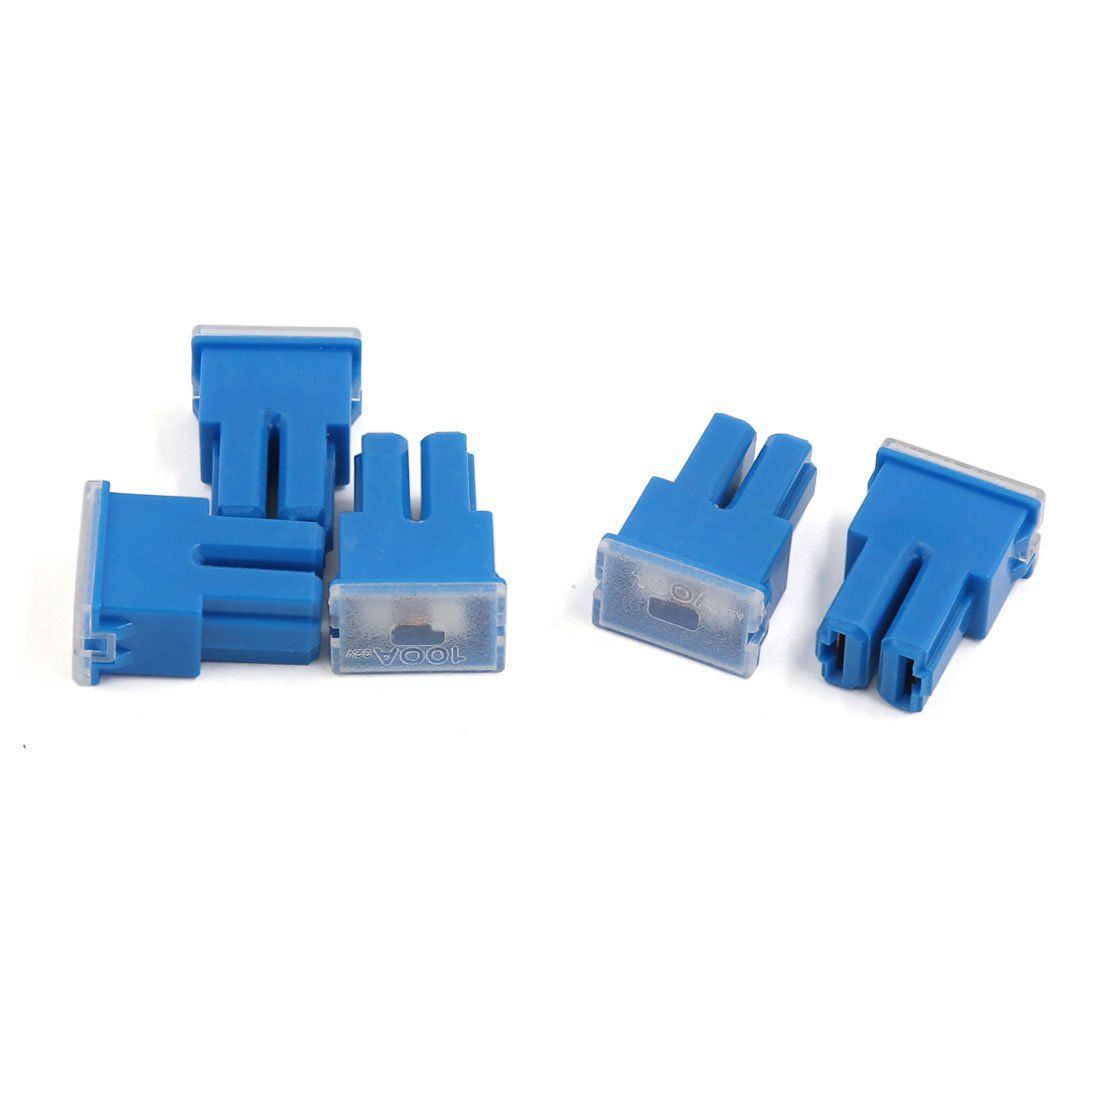 uxcell Automotive Mini Cartridge Fuse 32V 30A Female Terminal for Car Truck Vehicle 5pcs